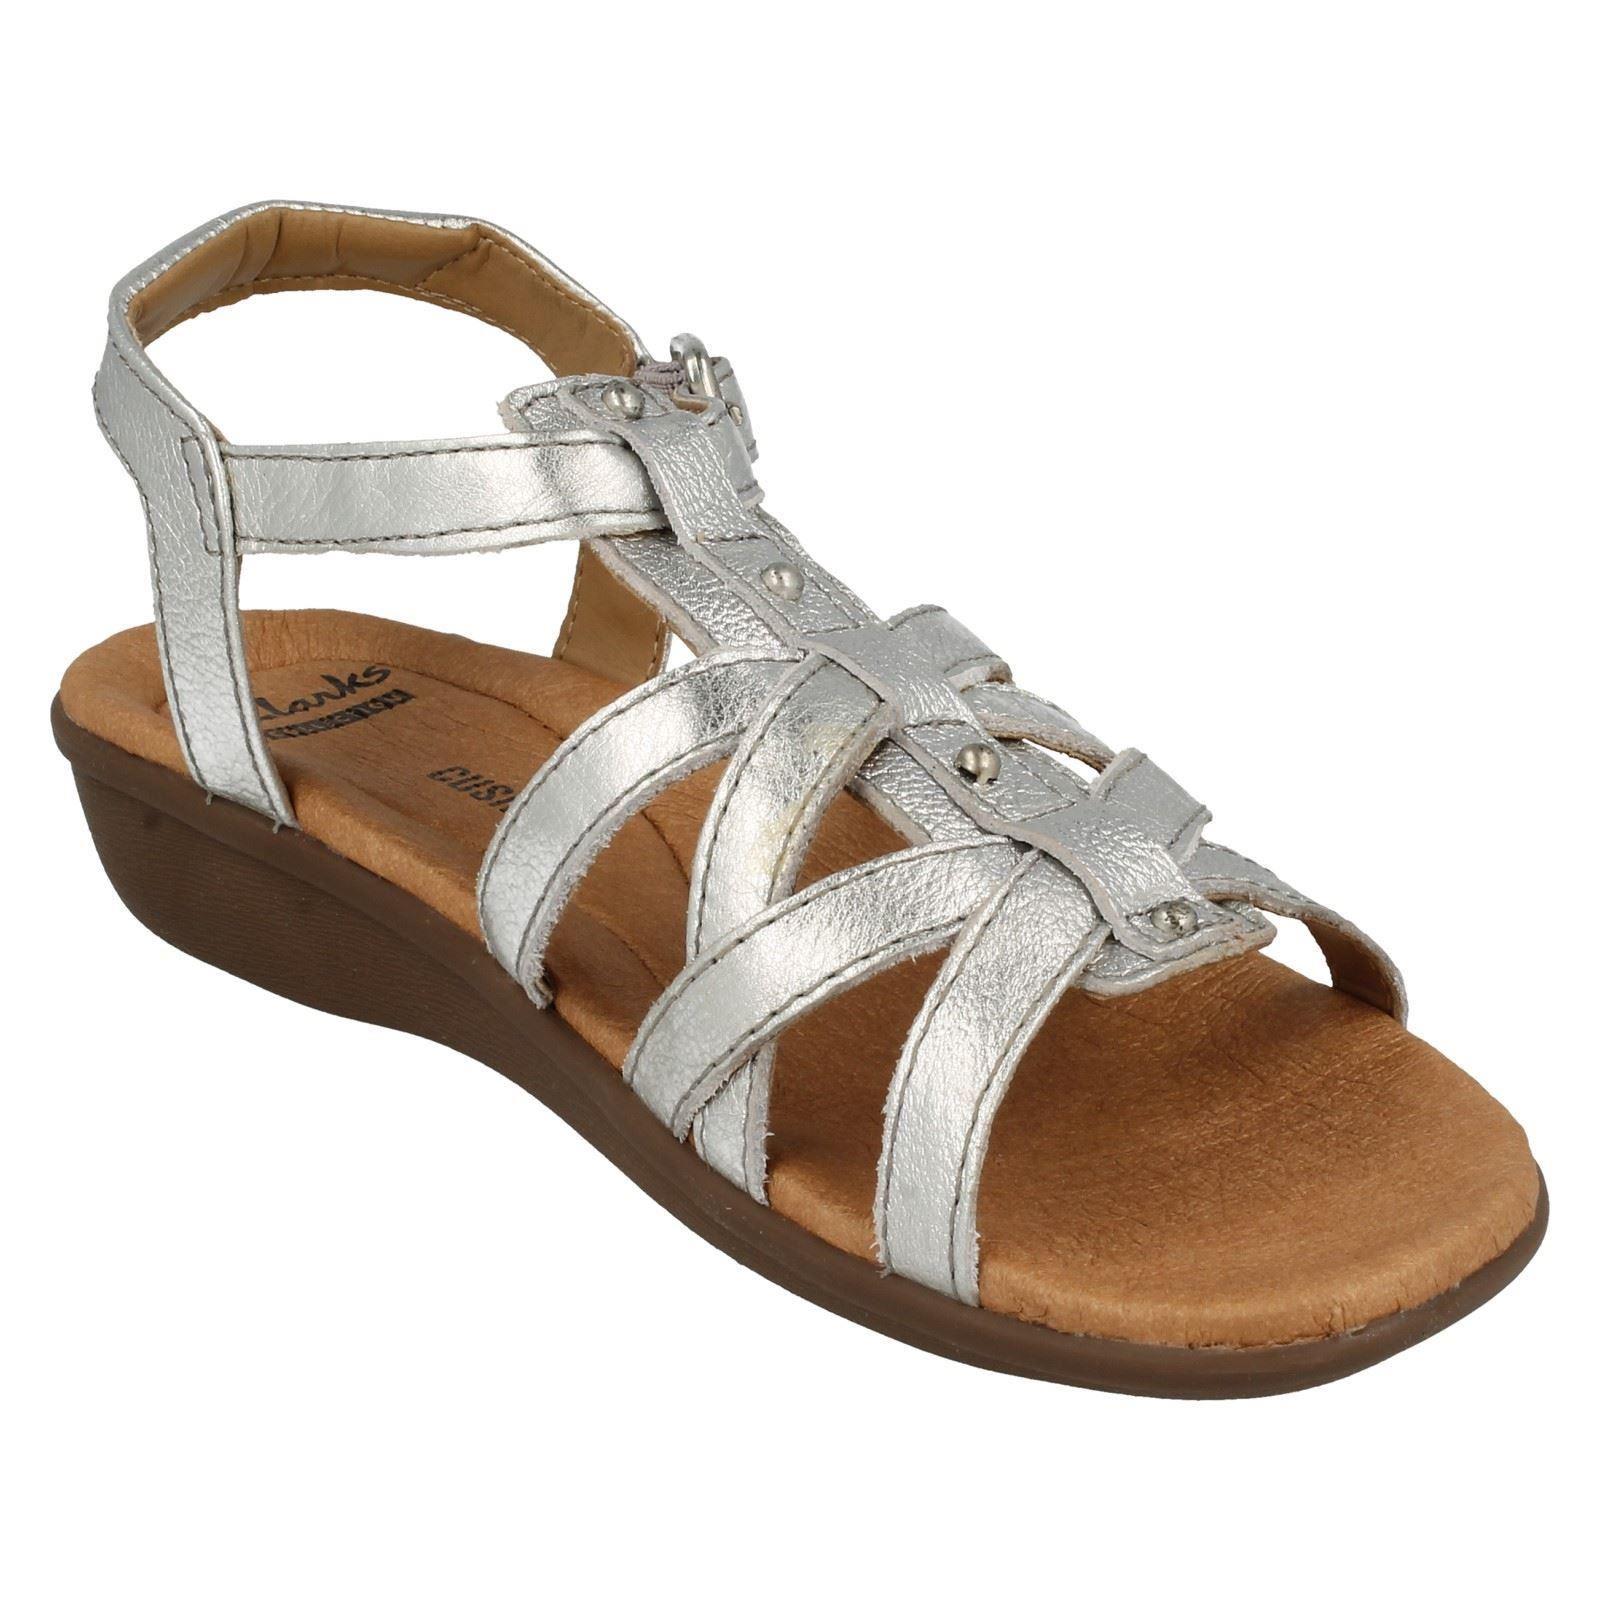 99580feea9de Ladies Clarks Manilla Bonita Leather Casual Sandals D Fitting UK 5.5 ...